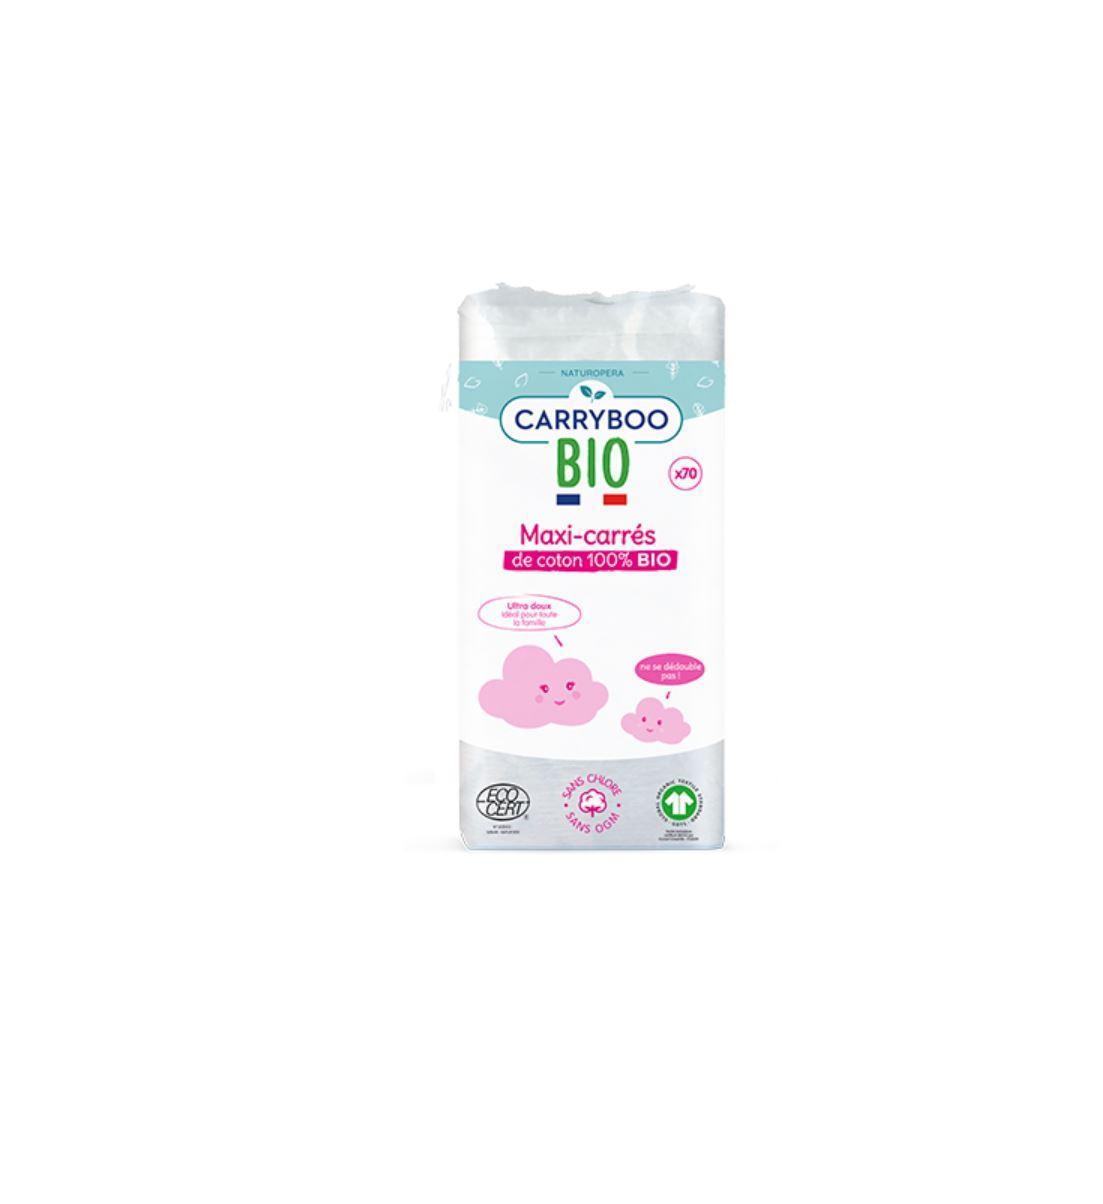 Maxi-Carrés de Coton 100% Bio